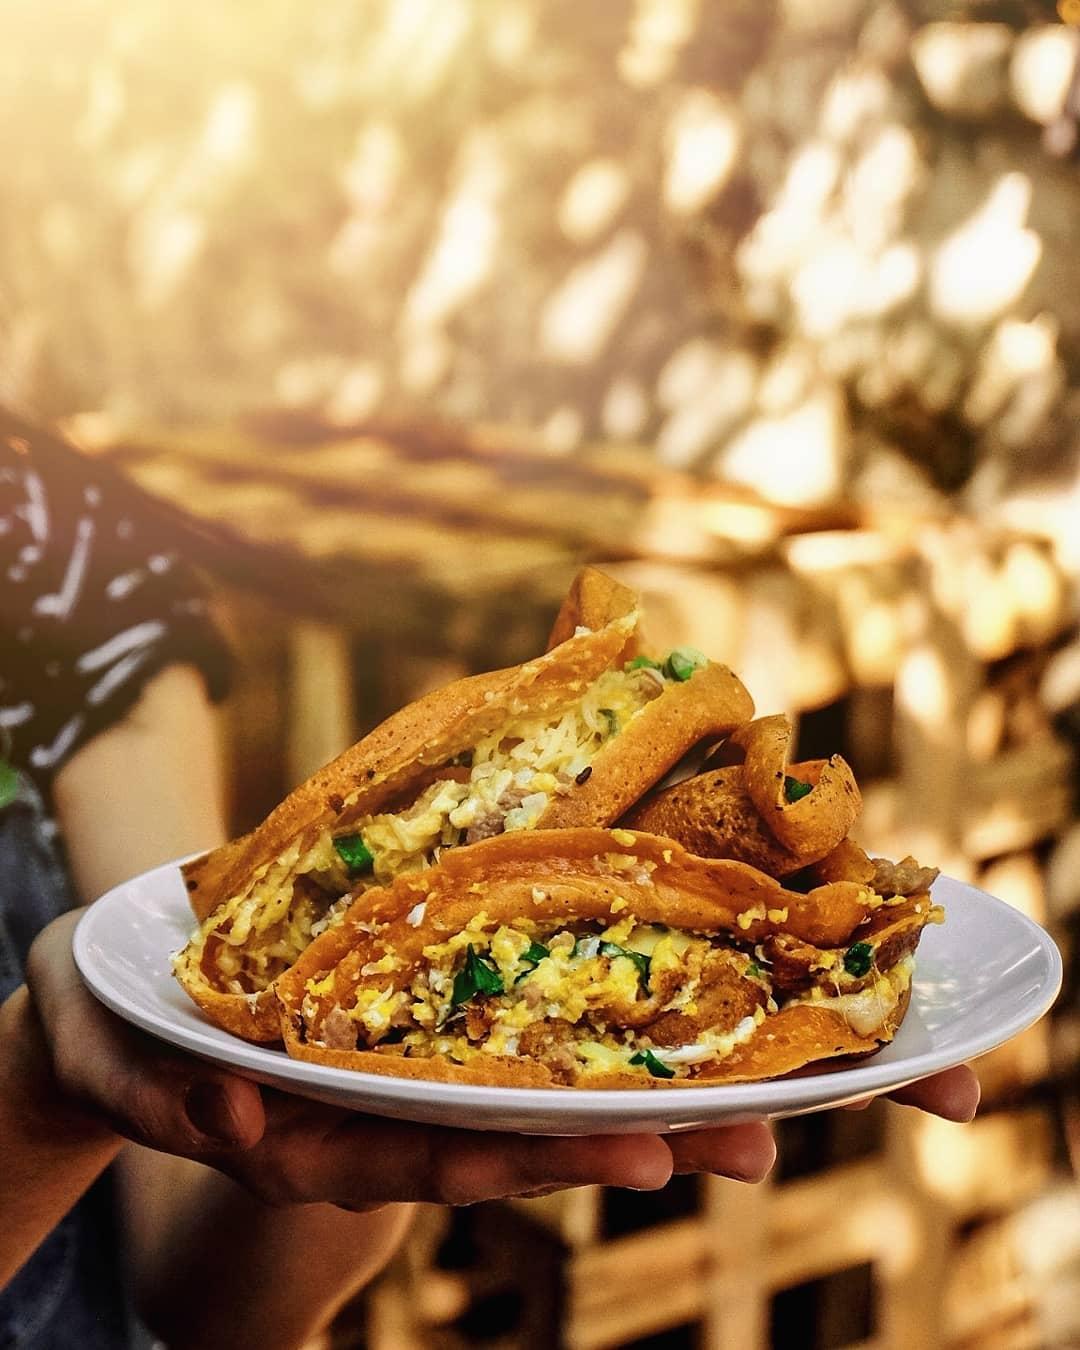 Enak Dan Terjangkau 13 Makanan Kaki Lima Di Semarang Yang Tidak